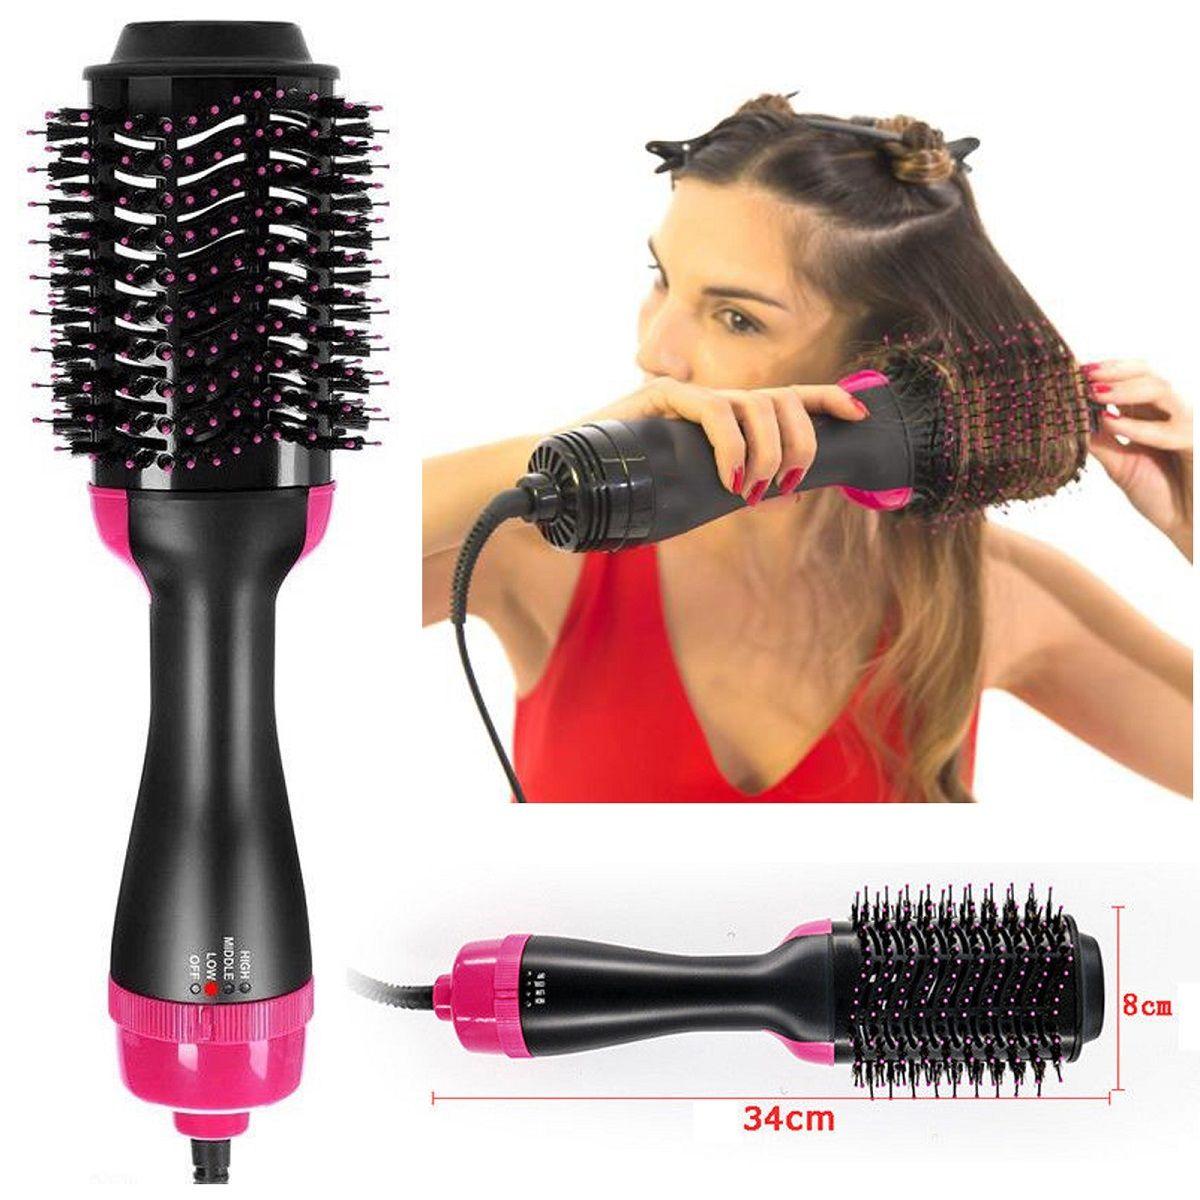 30+ Oval one step hair dryer volumizing styler ideas